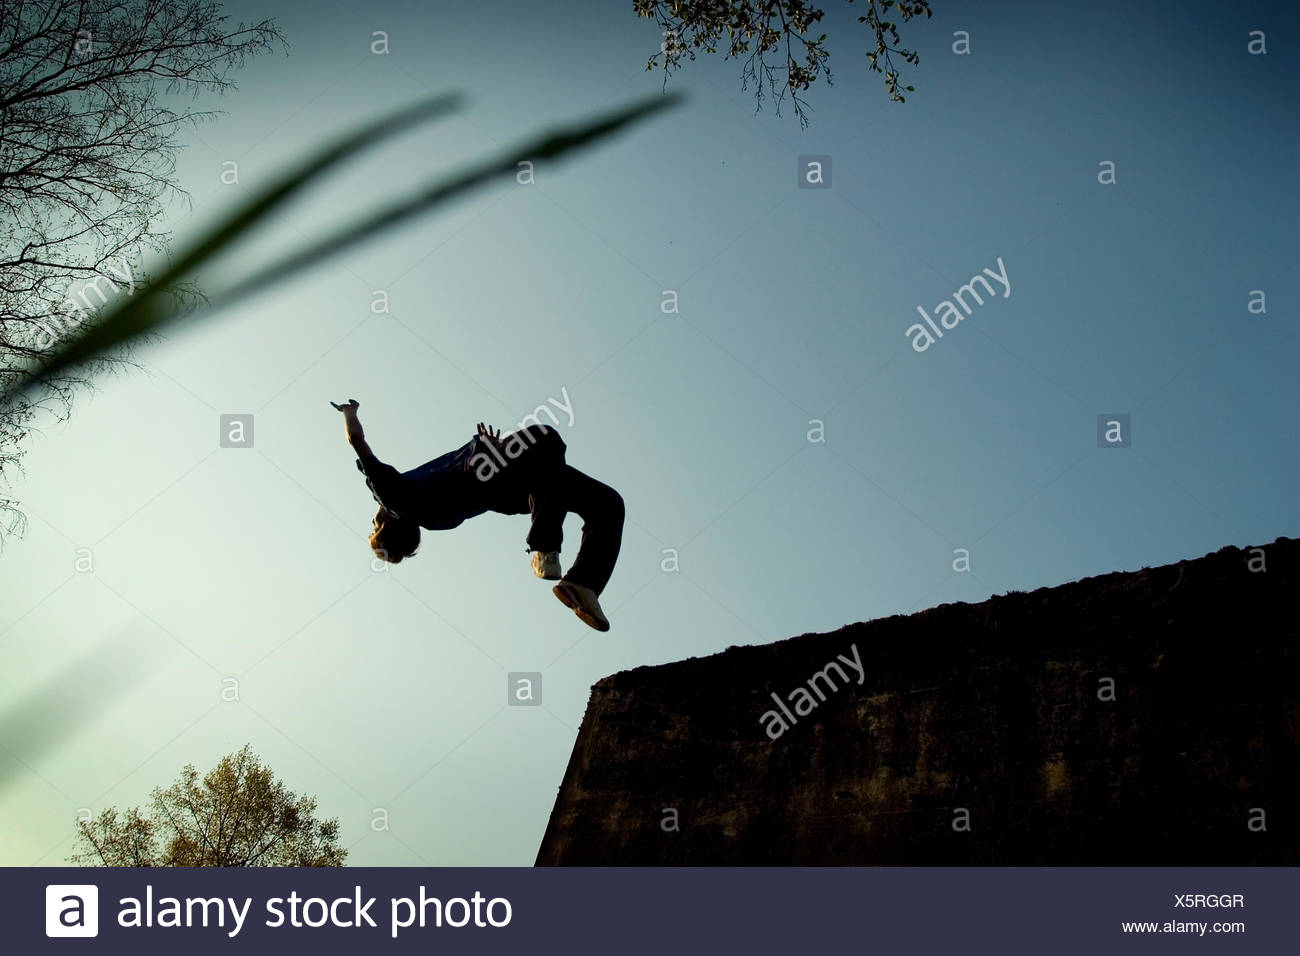 jump,parkour,somersault - Stock Image